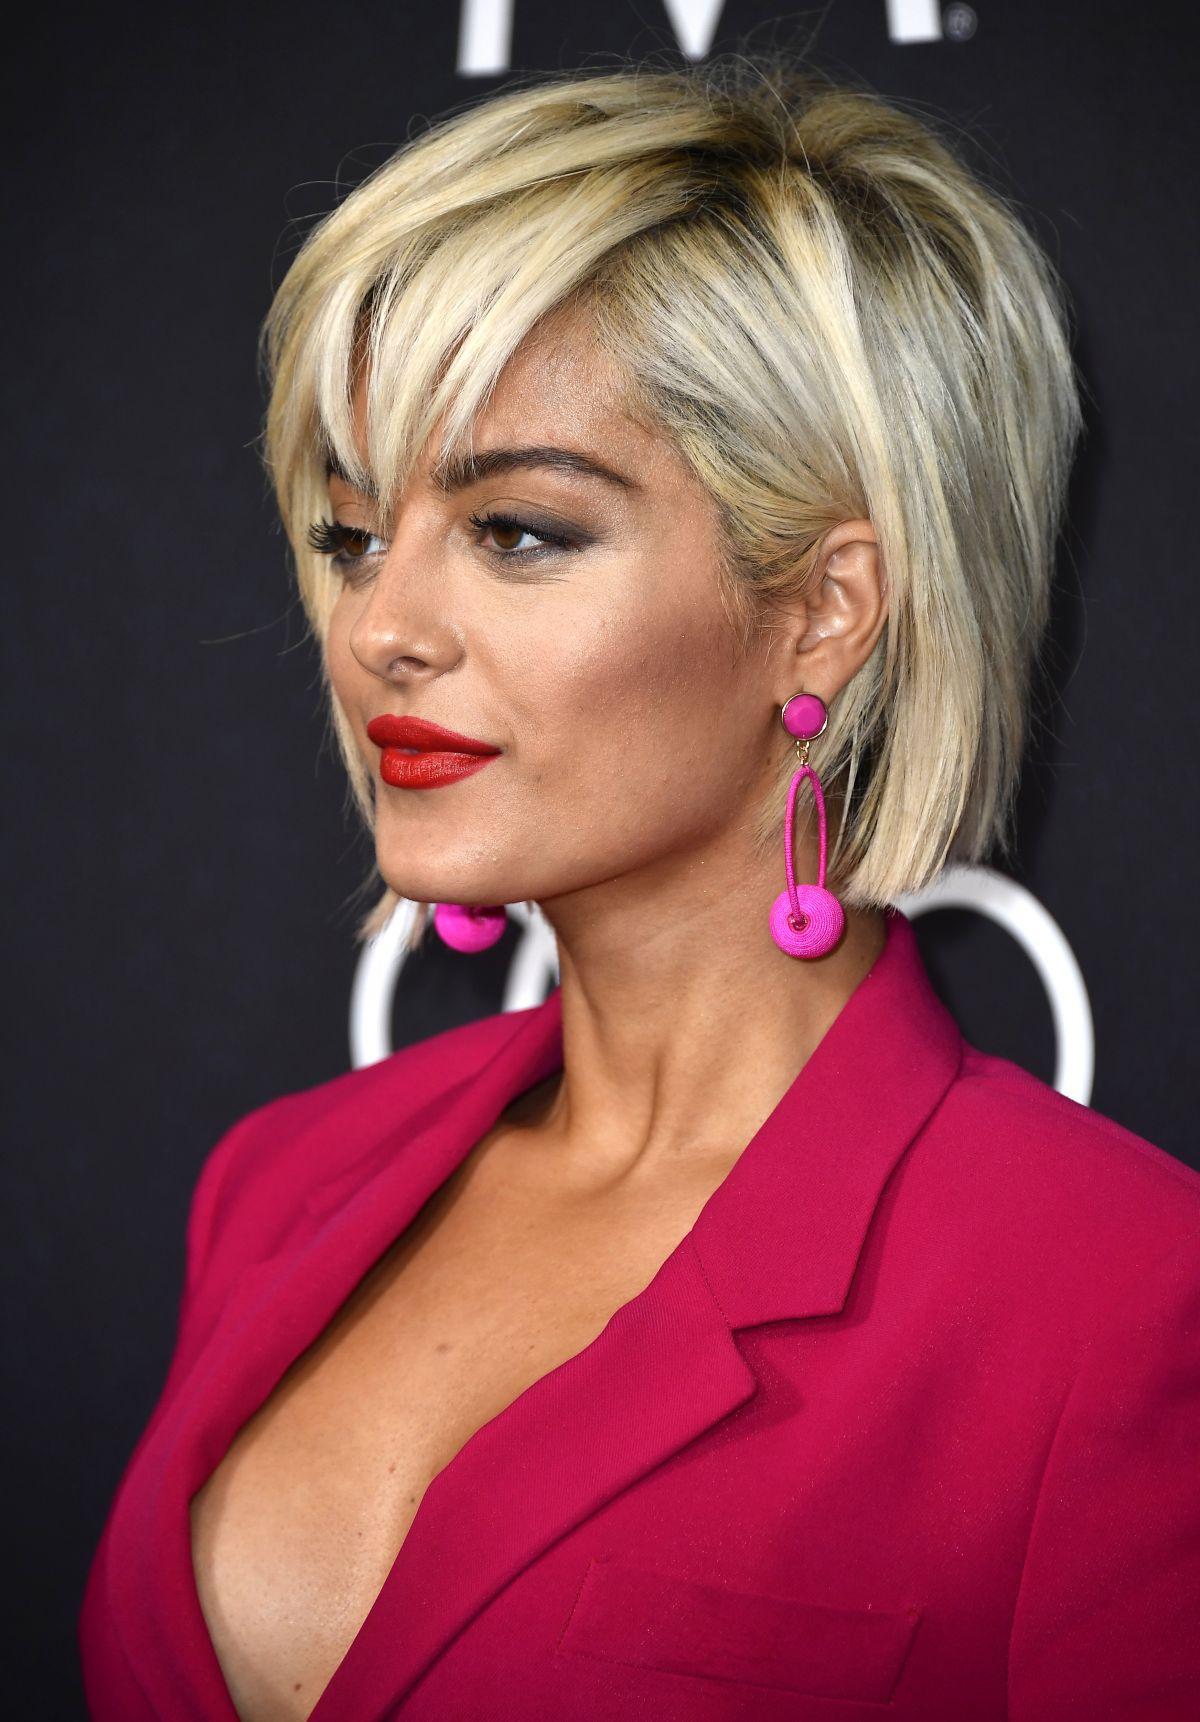 bebe-rexha-at-variety-s-power-of-women-2018-in-new-york-10-12-2018-7.jpg